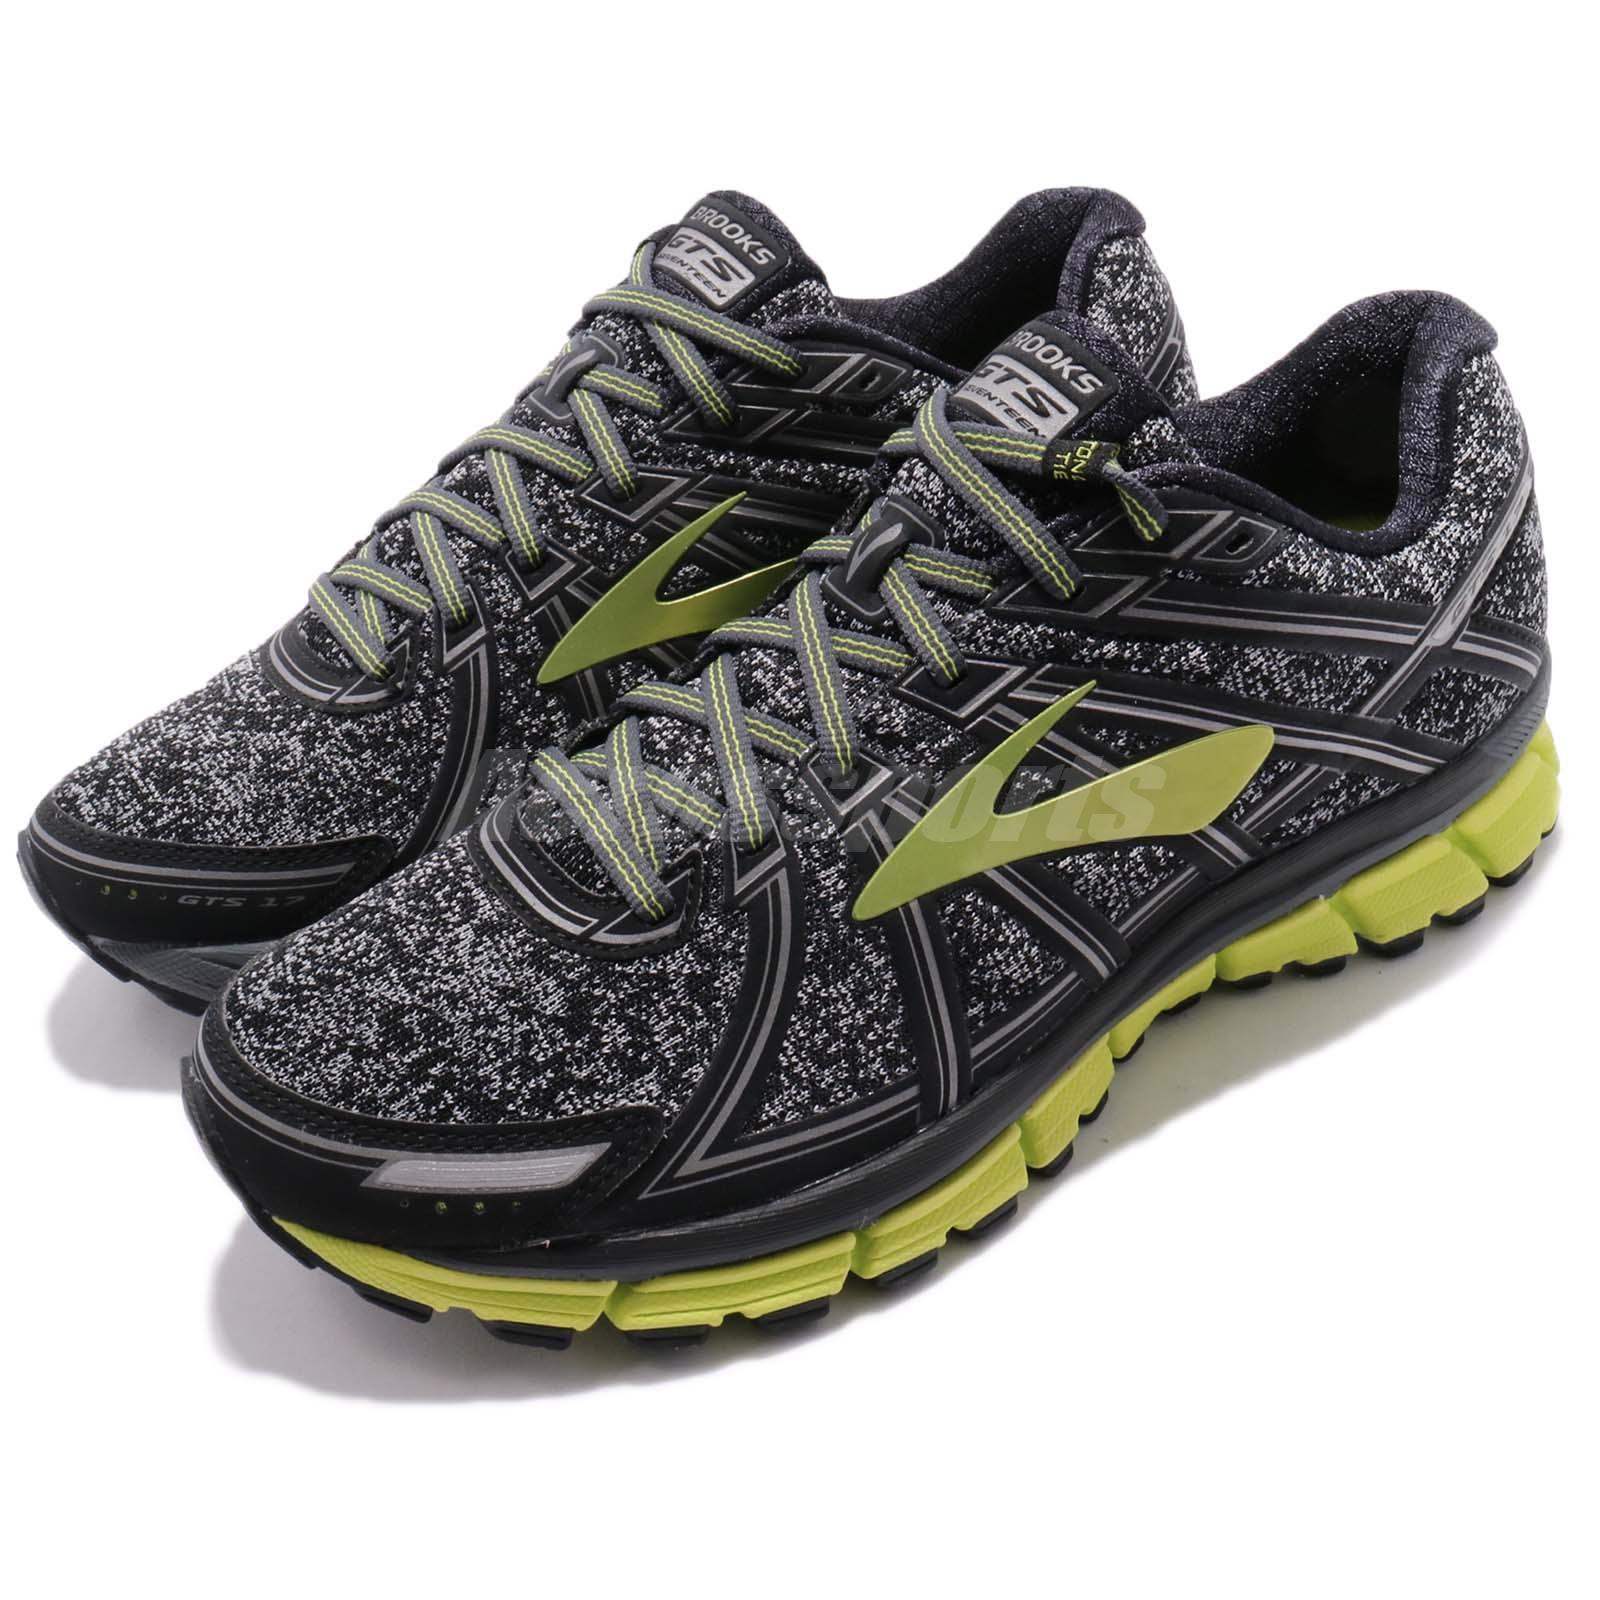 07ee229d4e5 Details about Brooks Adrenaline GTS 17 Metallic Charcoal Black Men Running  Shoes 1102411 D